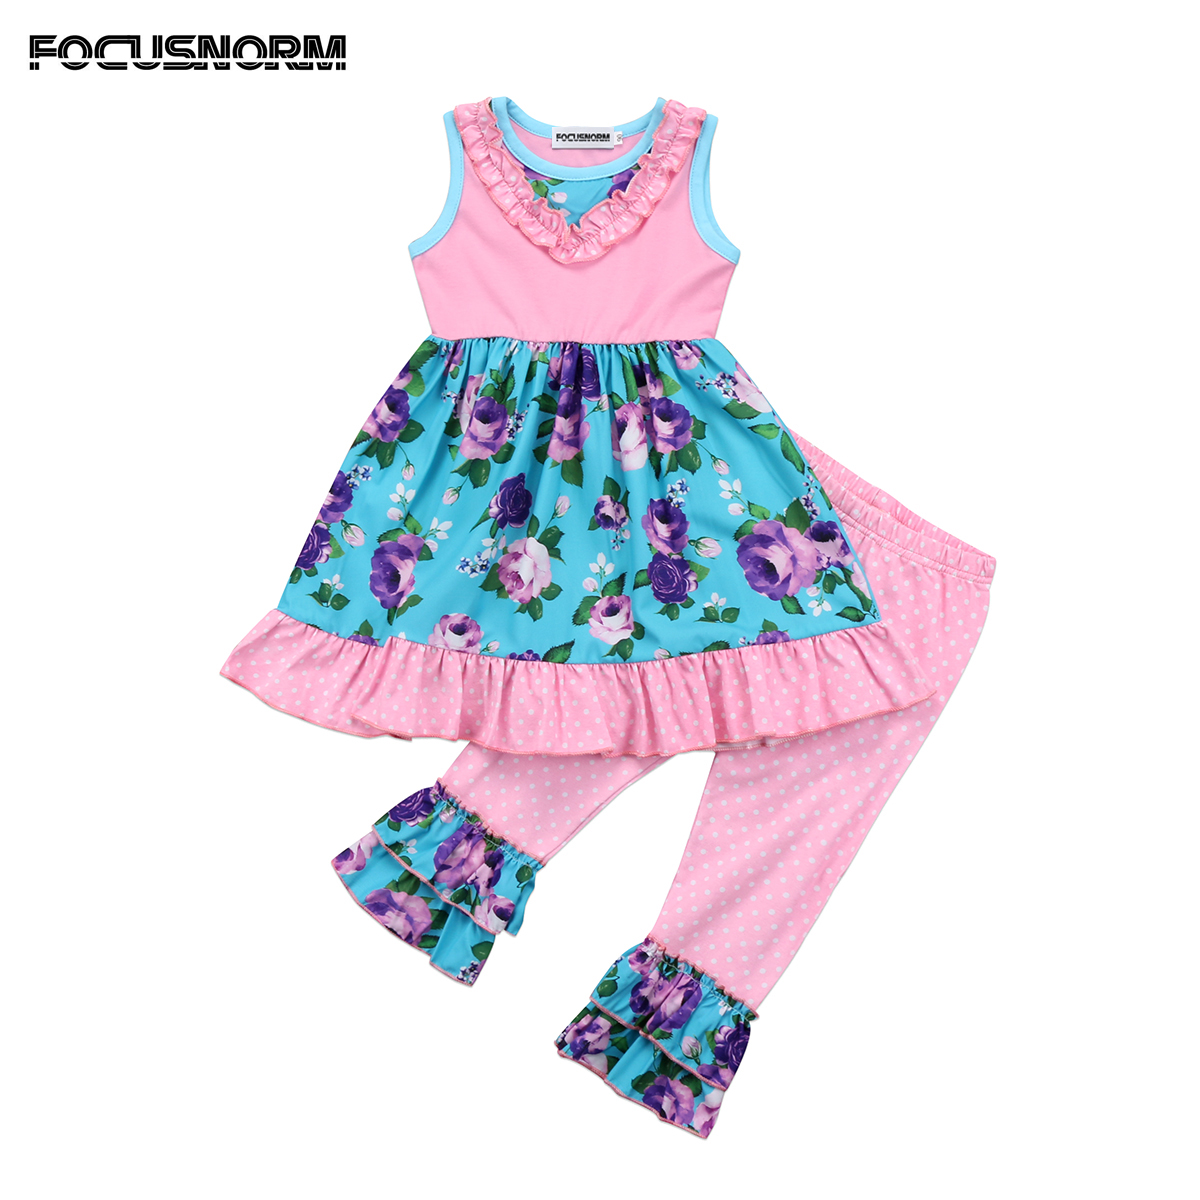 Newborn Toddler Baby Girls Kids Floral Outfits Ruffle Floral Tutu Dress Tops+Long Pants 2Pcs Clothes Set floral baby girls clothes long sleeve sweatshirt pants outfits 2pcs hooded clothes set